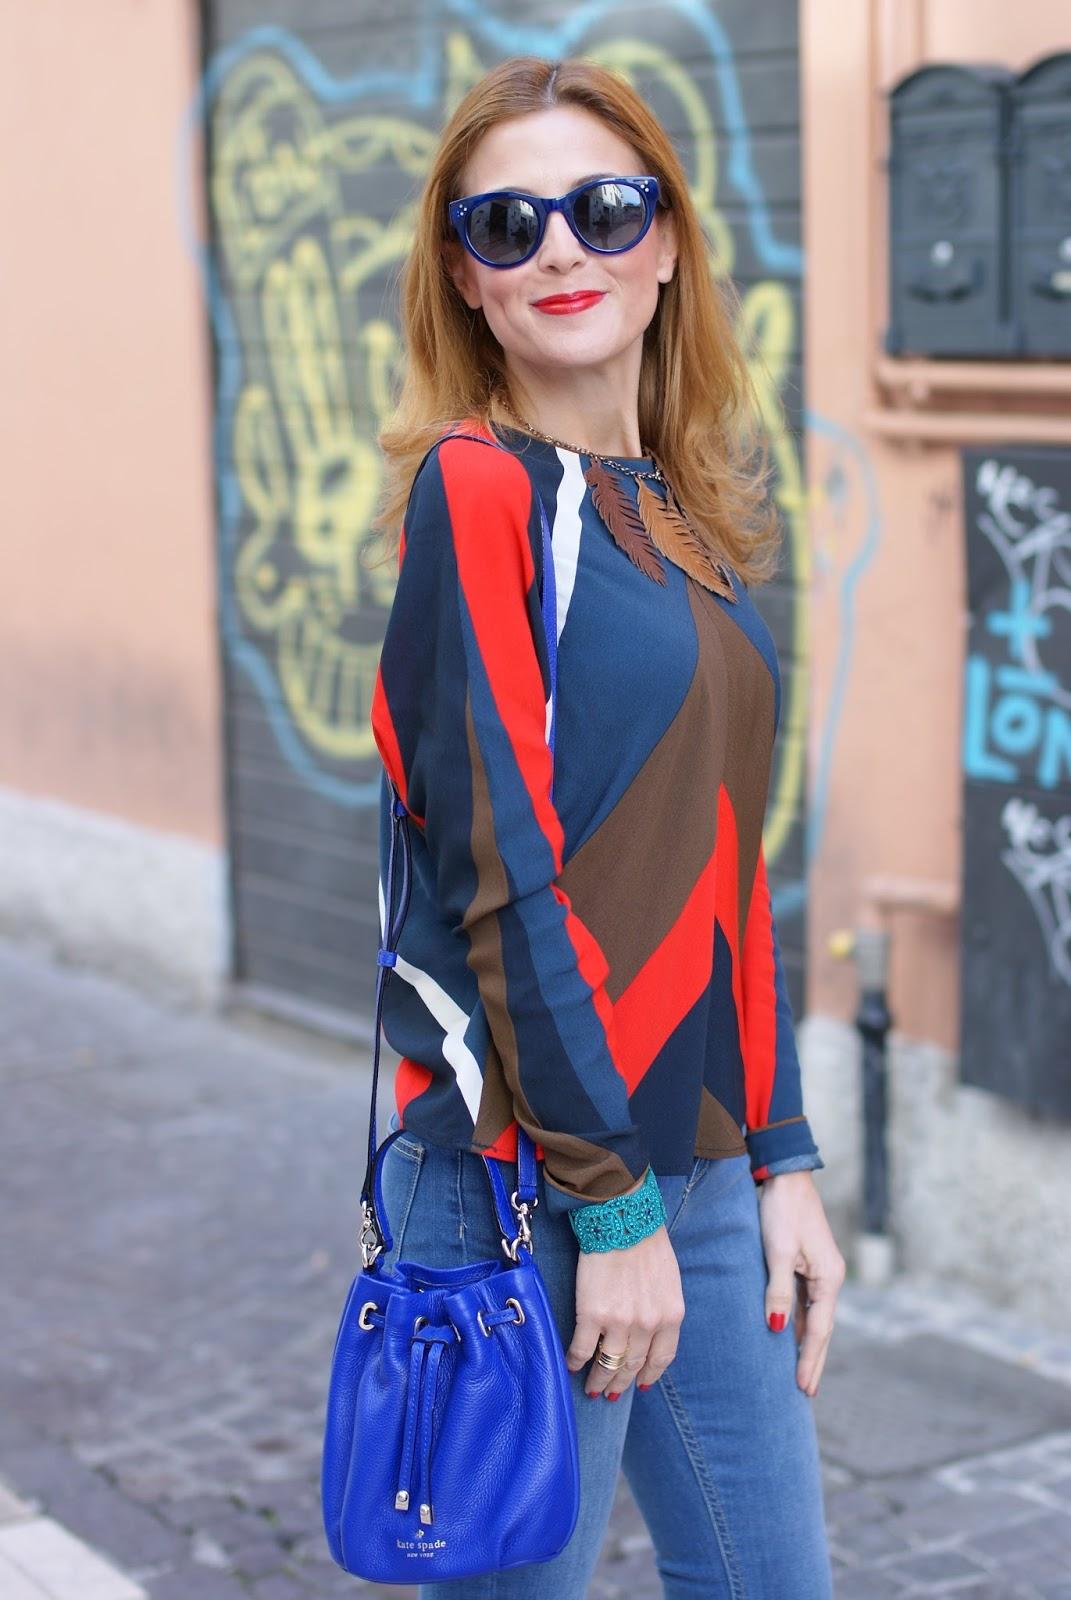 Kate Spade Wyatt mini bucket bag and Zara blouse on Fashion and Cookies fashion blog, fashion blogger style